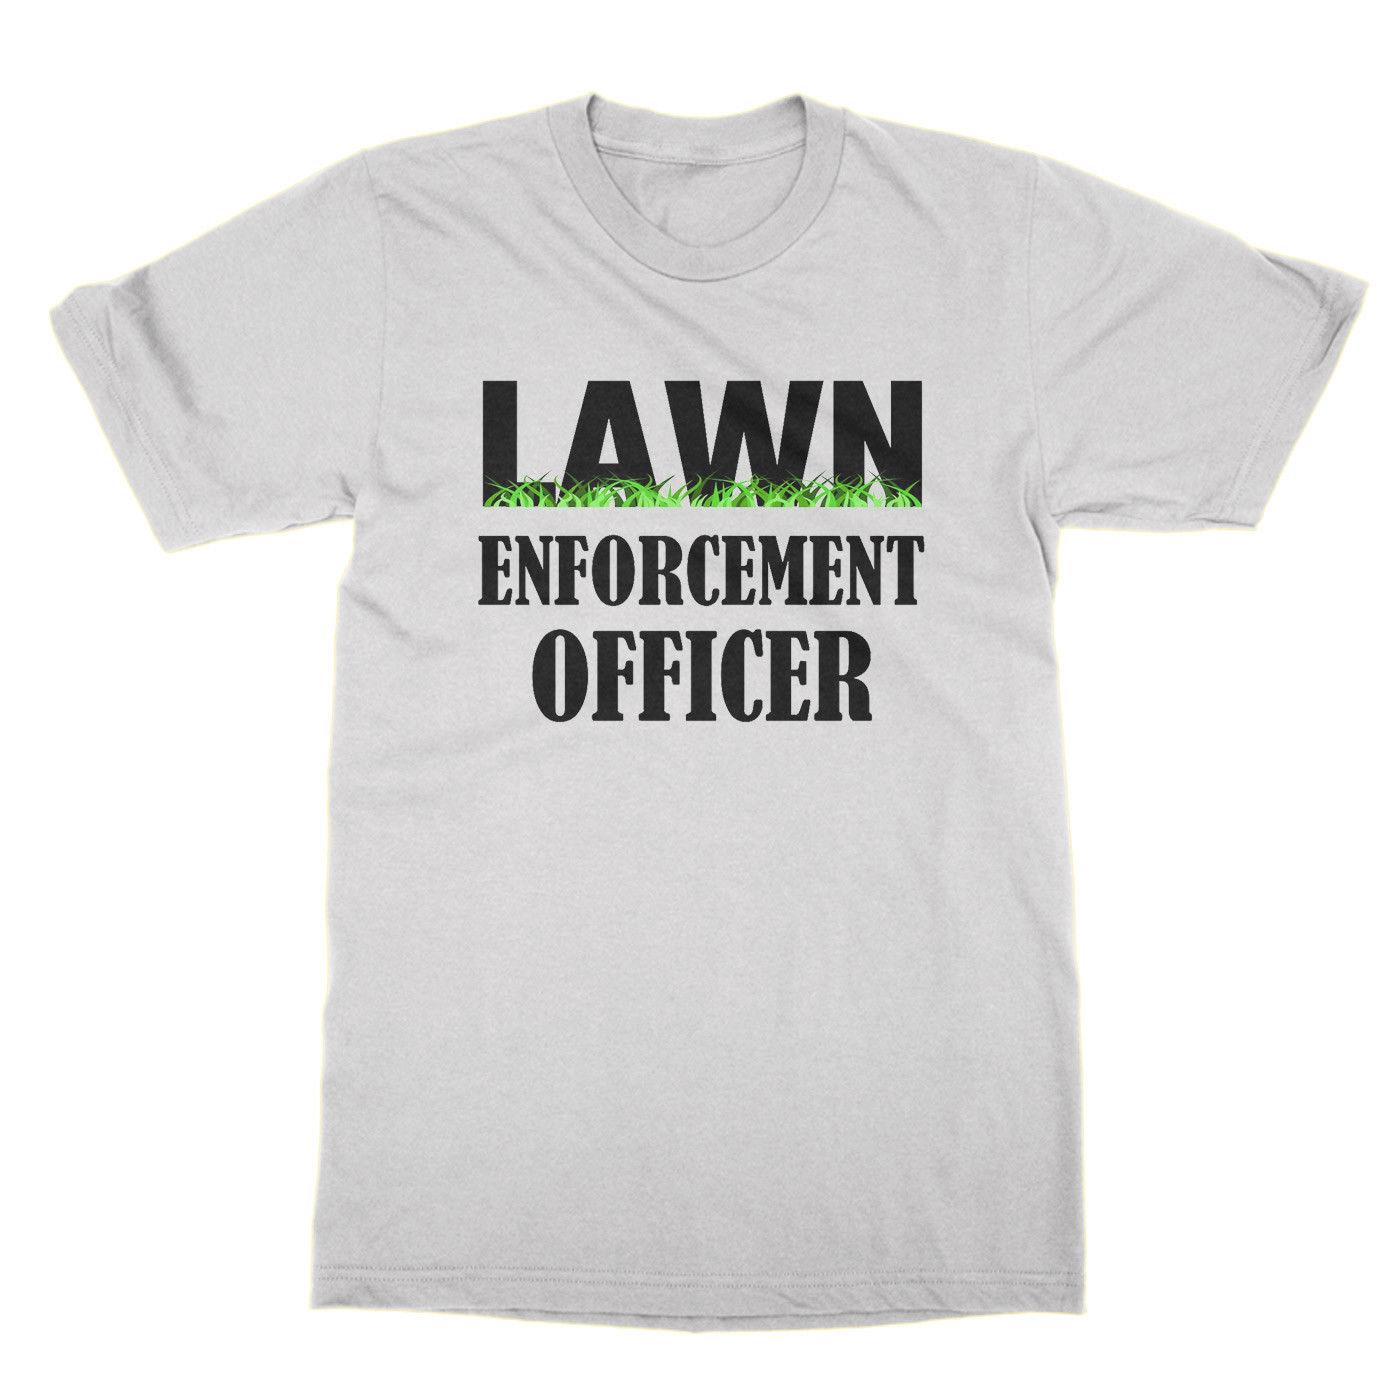 Lawn Enforcement Officer unisex t-shirt funny gardening gardner shirt Harajuku Tops Fashion Classic Unique free shipping